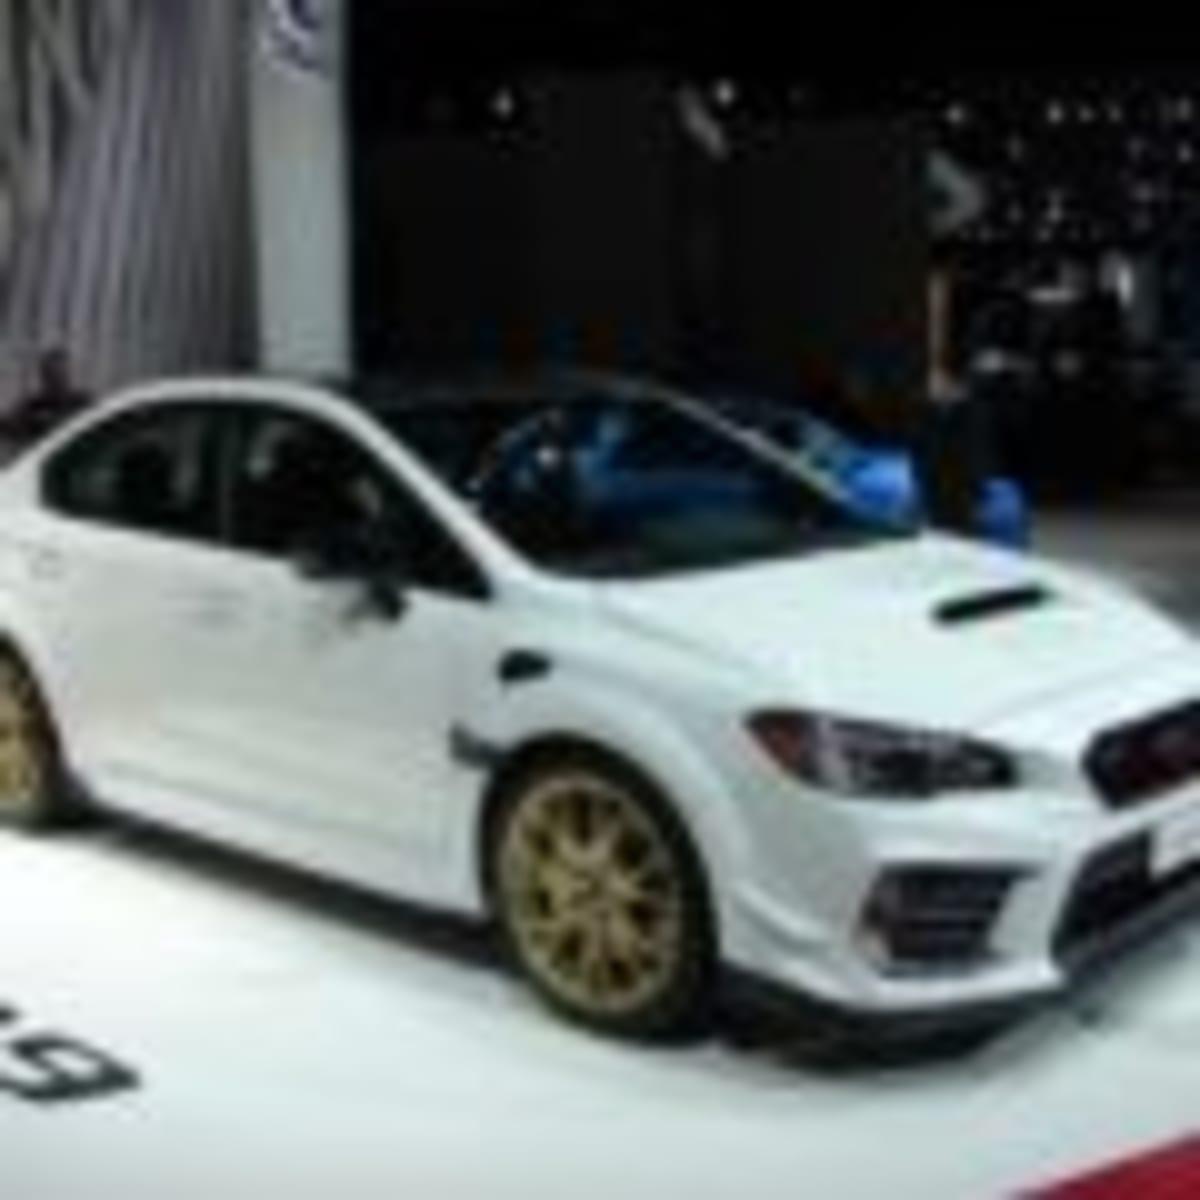 Subaru S209 (Mark Dapoz)